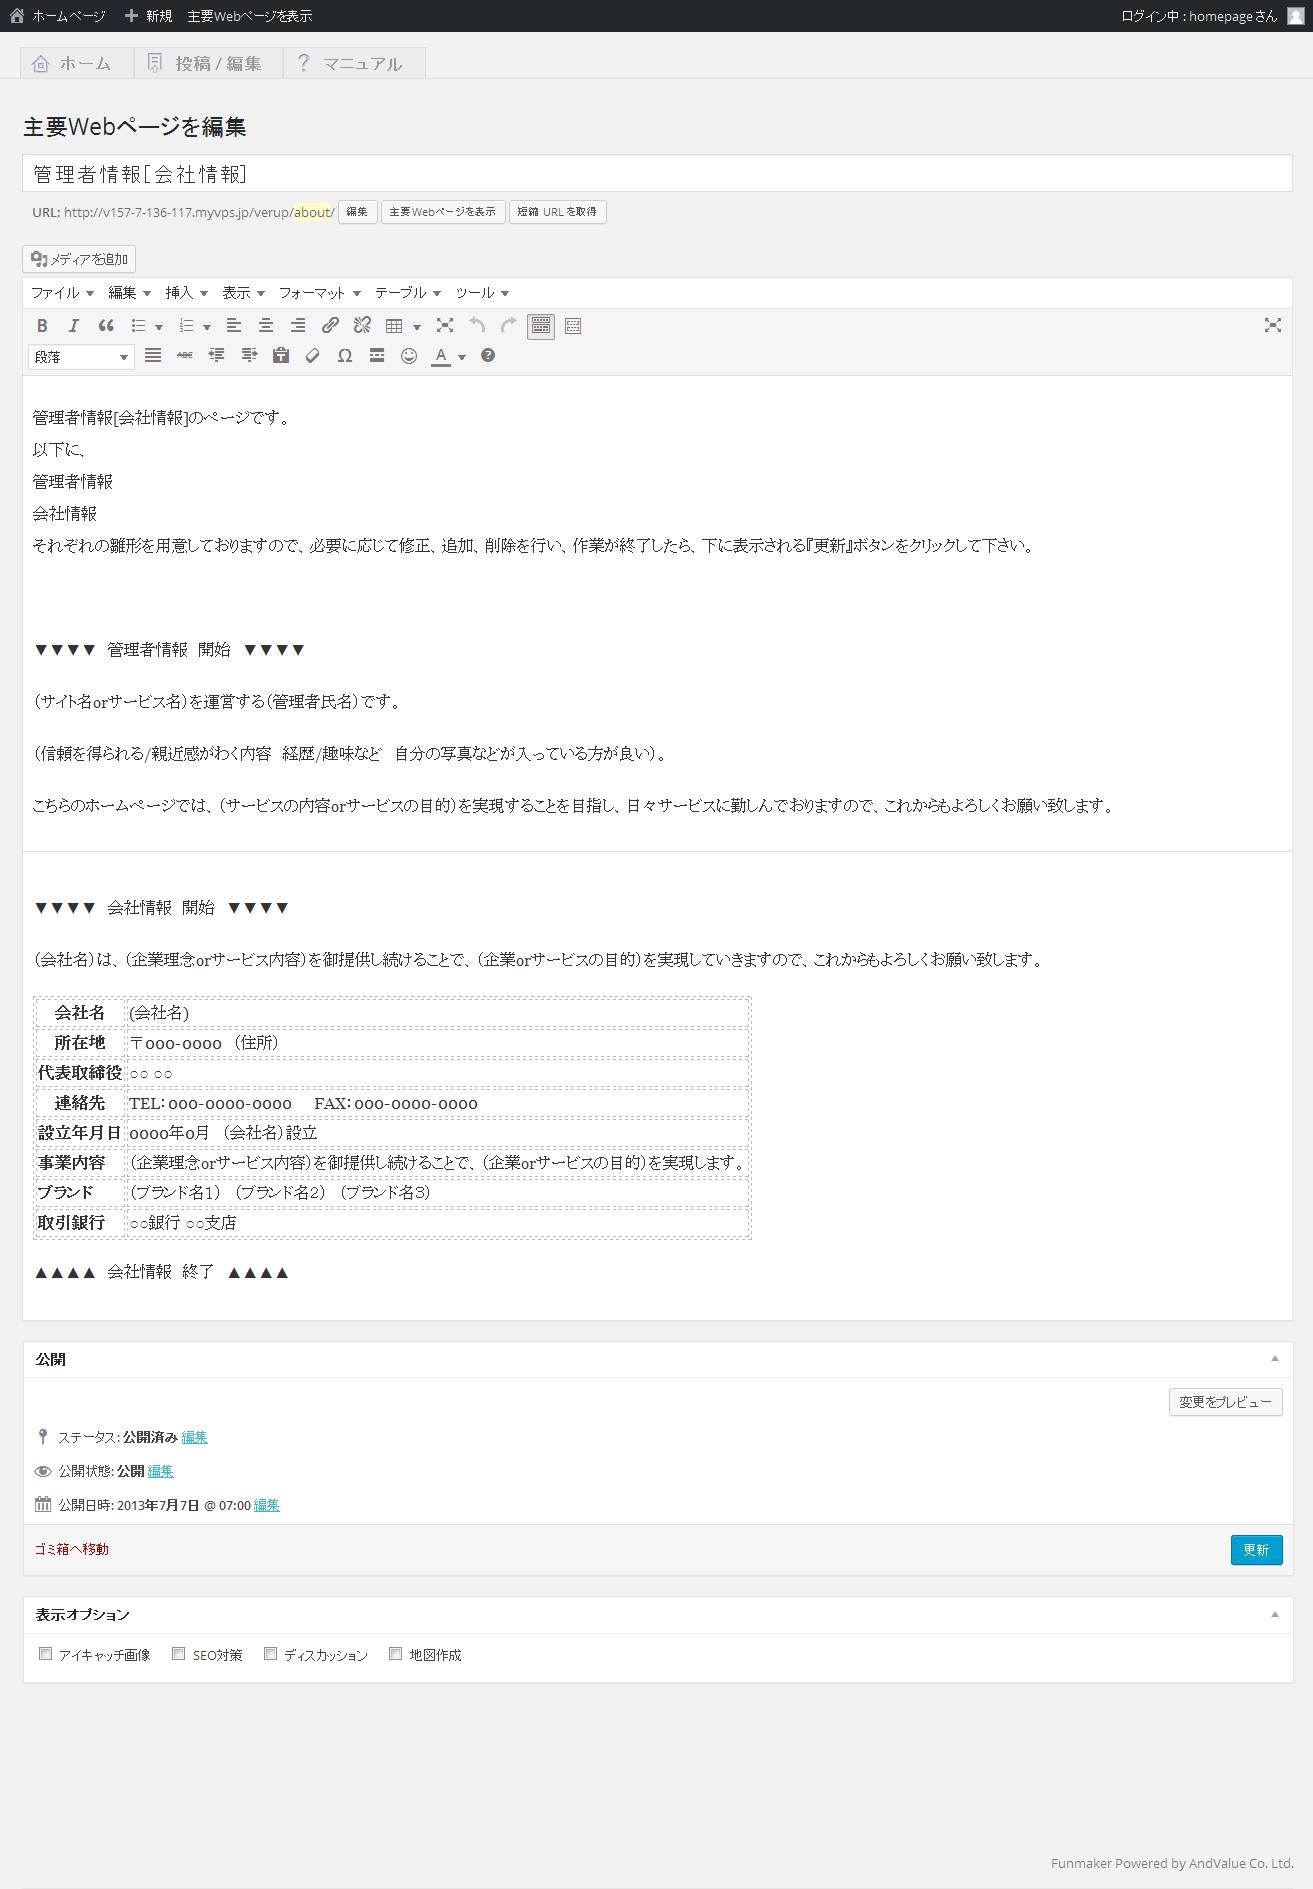 管理者情報[会社情報] 編集画面 | 初期費用無料ホームページ作成サイト - FunMaker